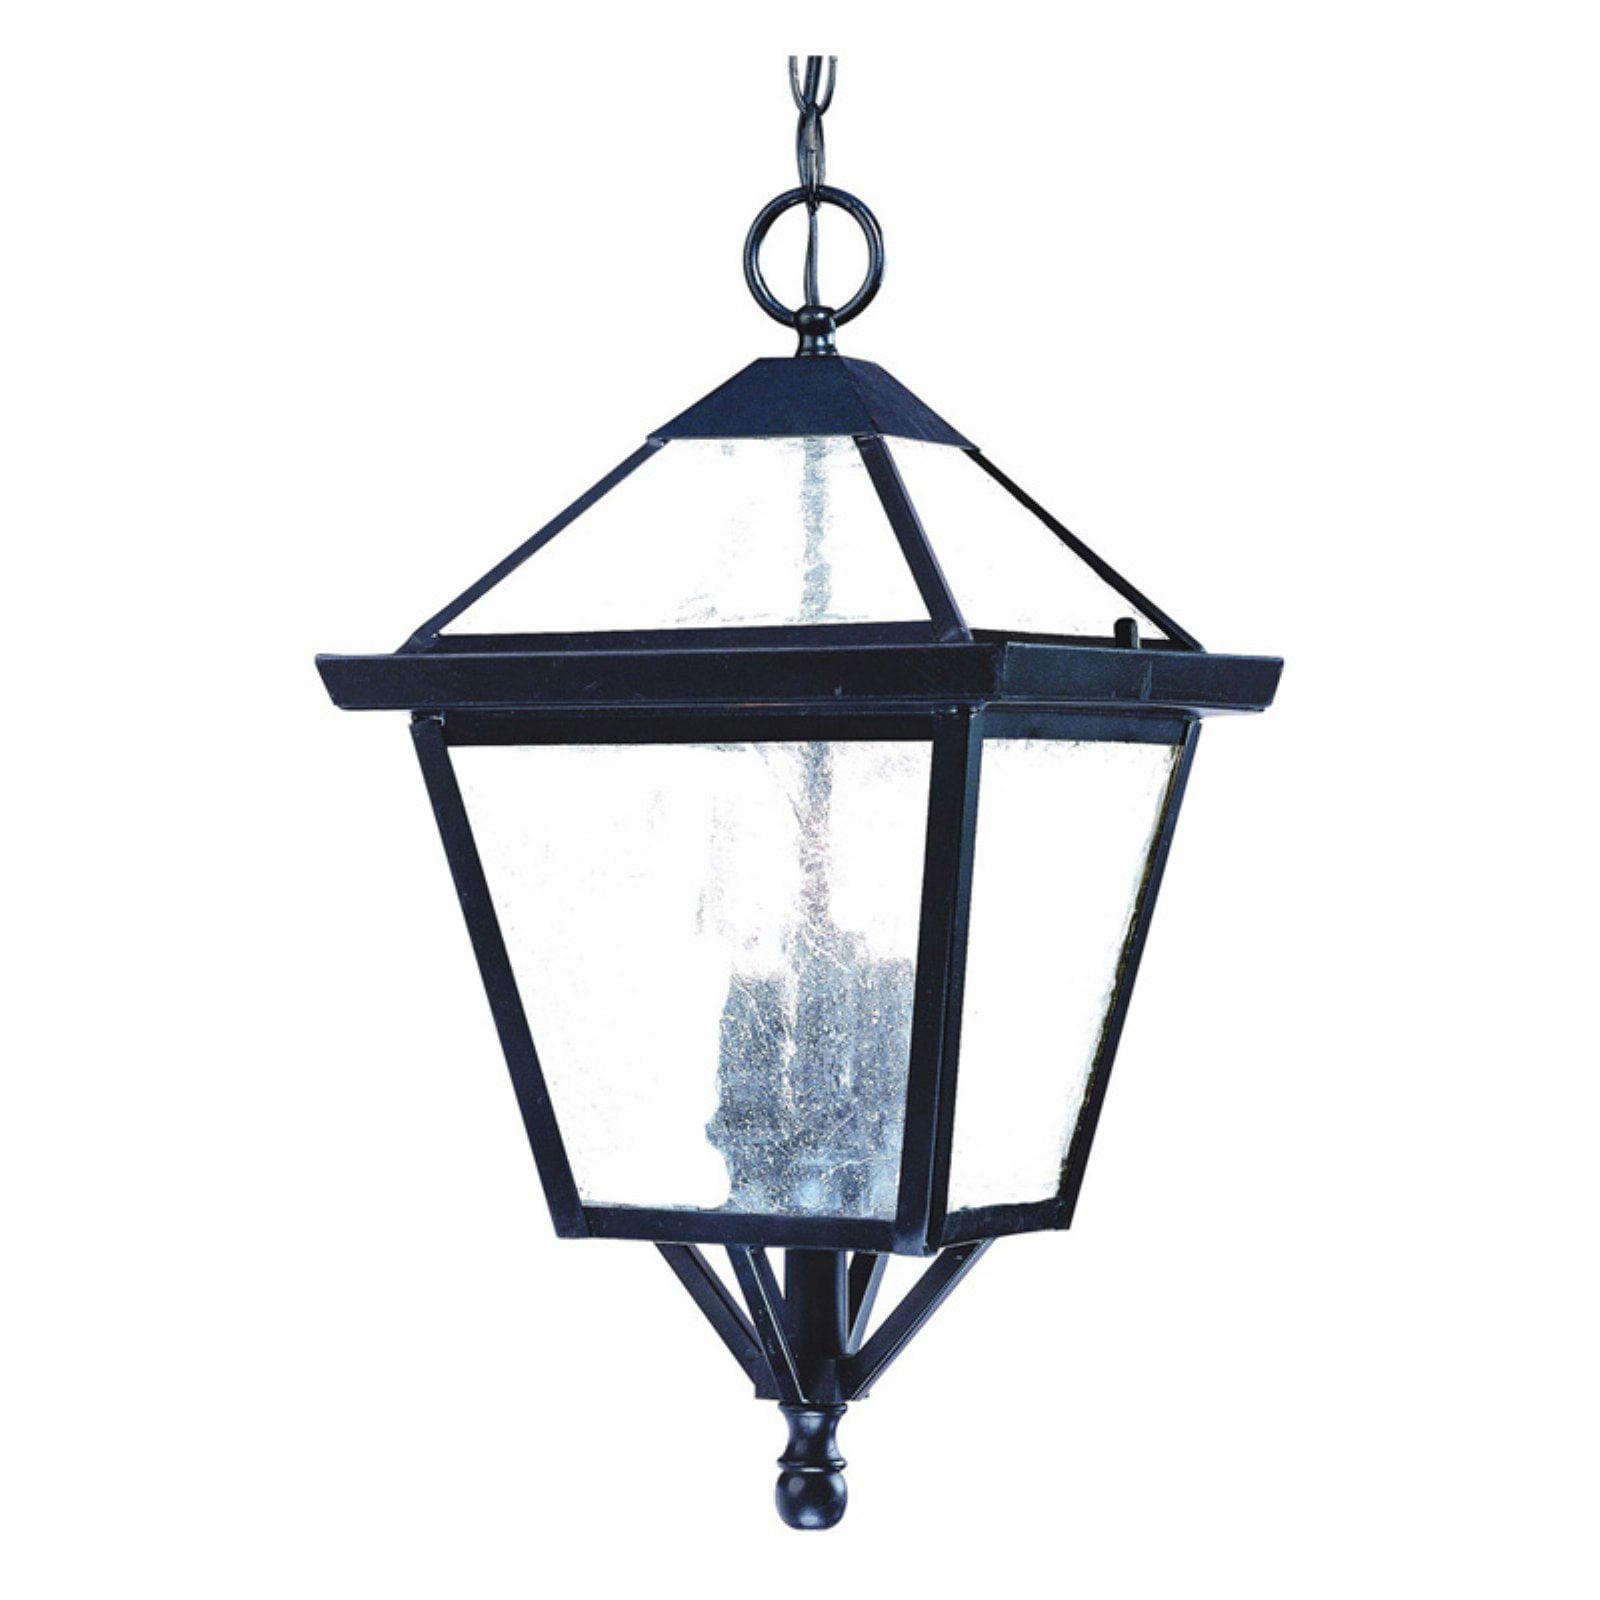 Acclaim Lighting Bay Street 3 Light Outdoor Hanging Lantern Light Fixture by Acclaim Lighting